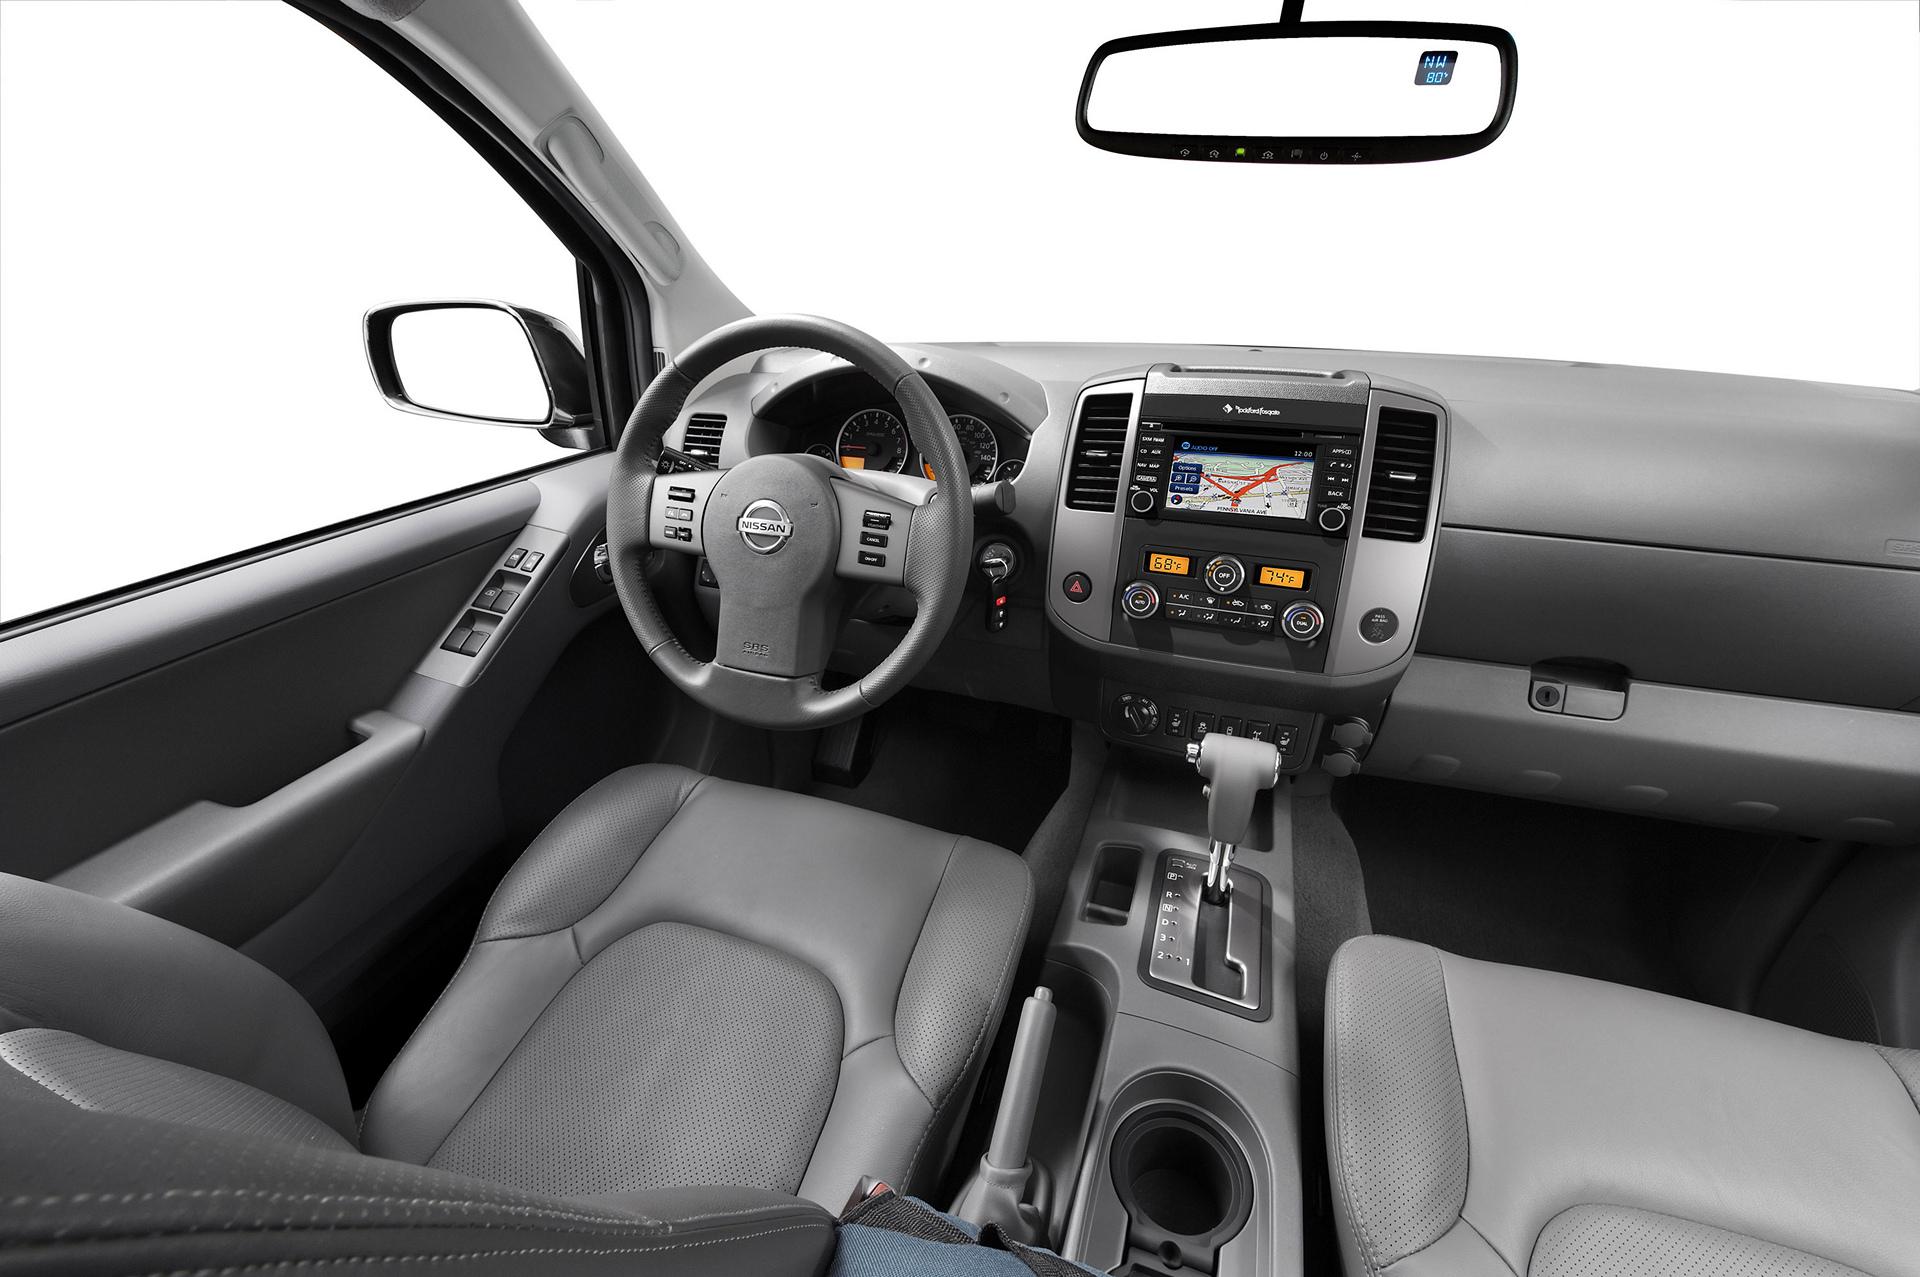 2016 Nissan Frontier © Nissan Motor Co., Ltd.